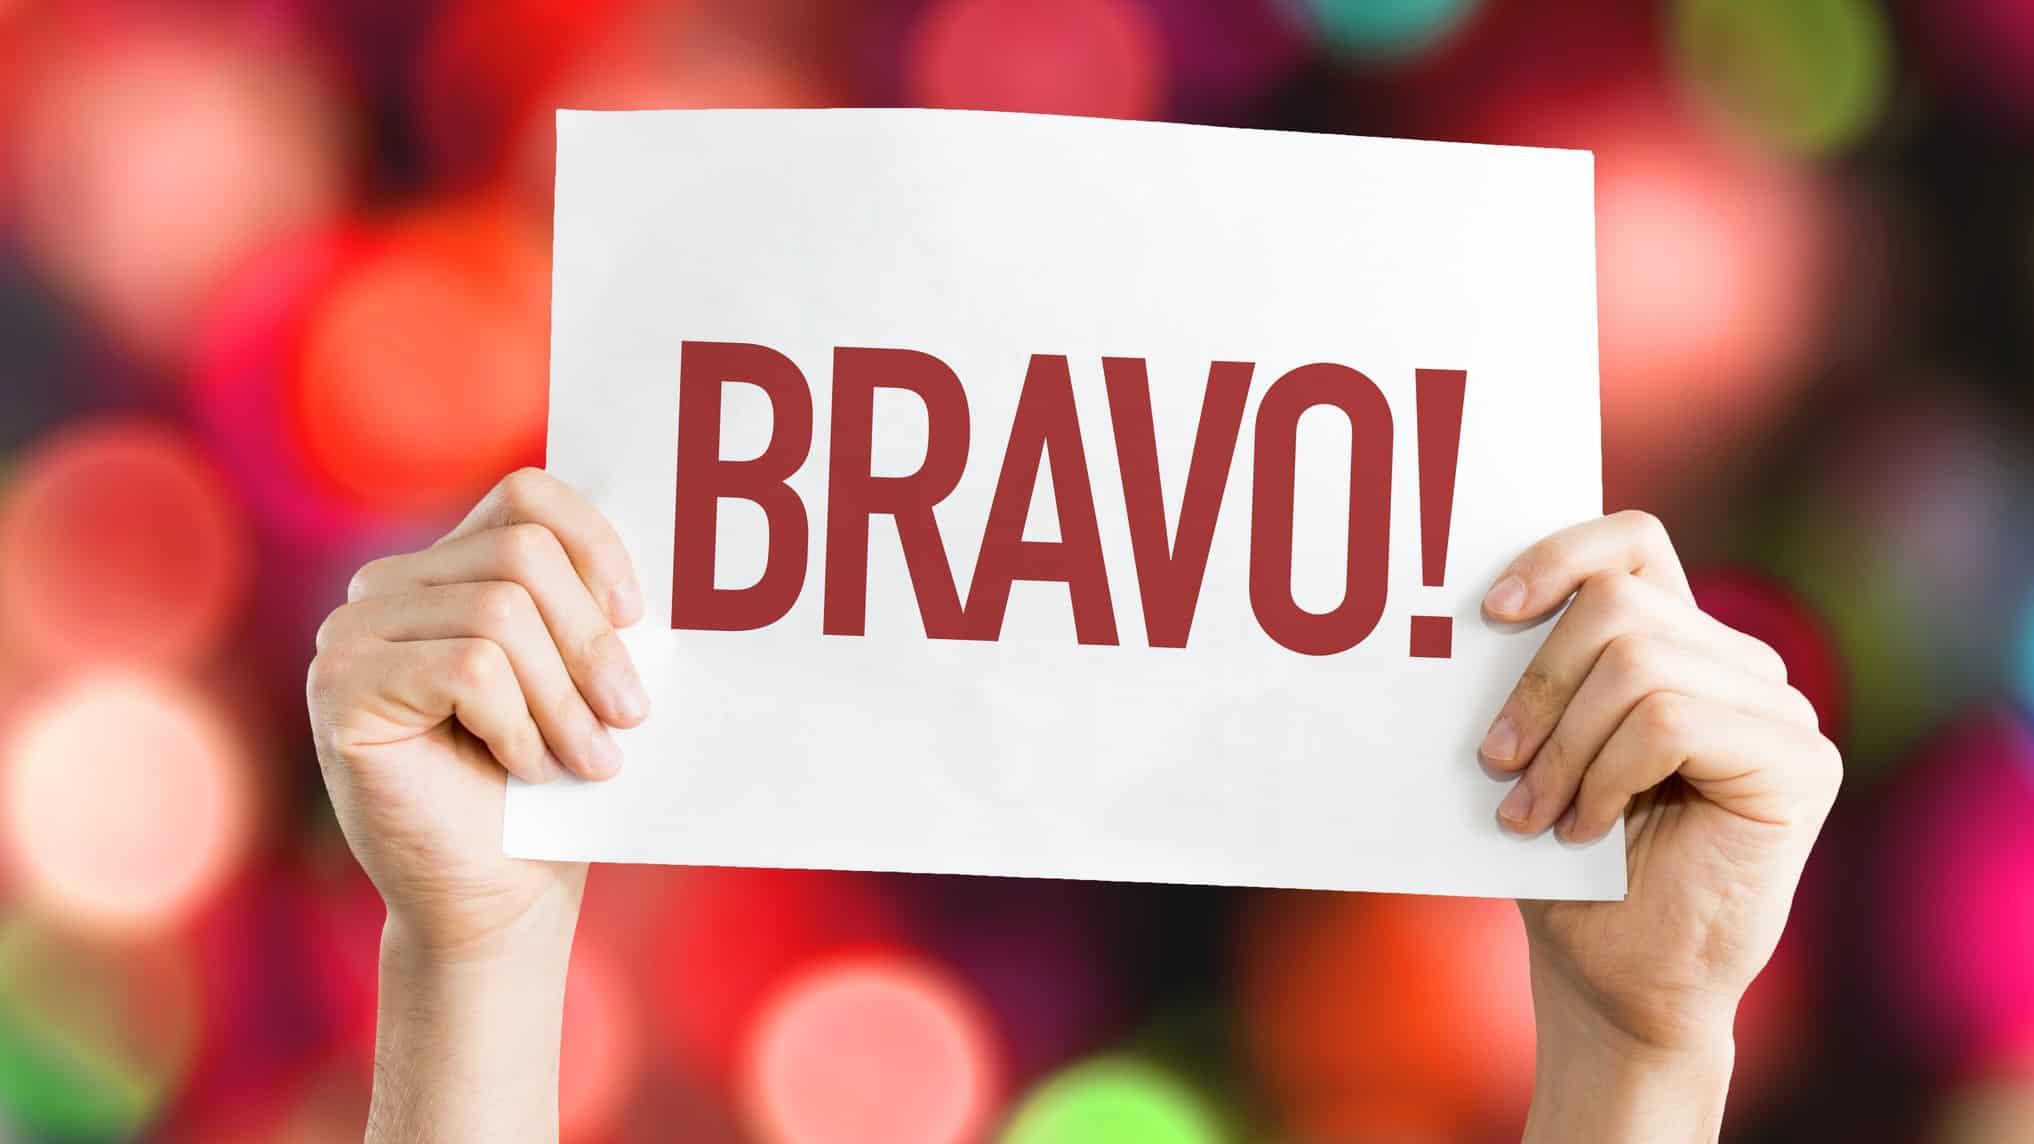 Hands holding sign saying 'Bravo!'